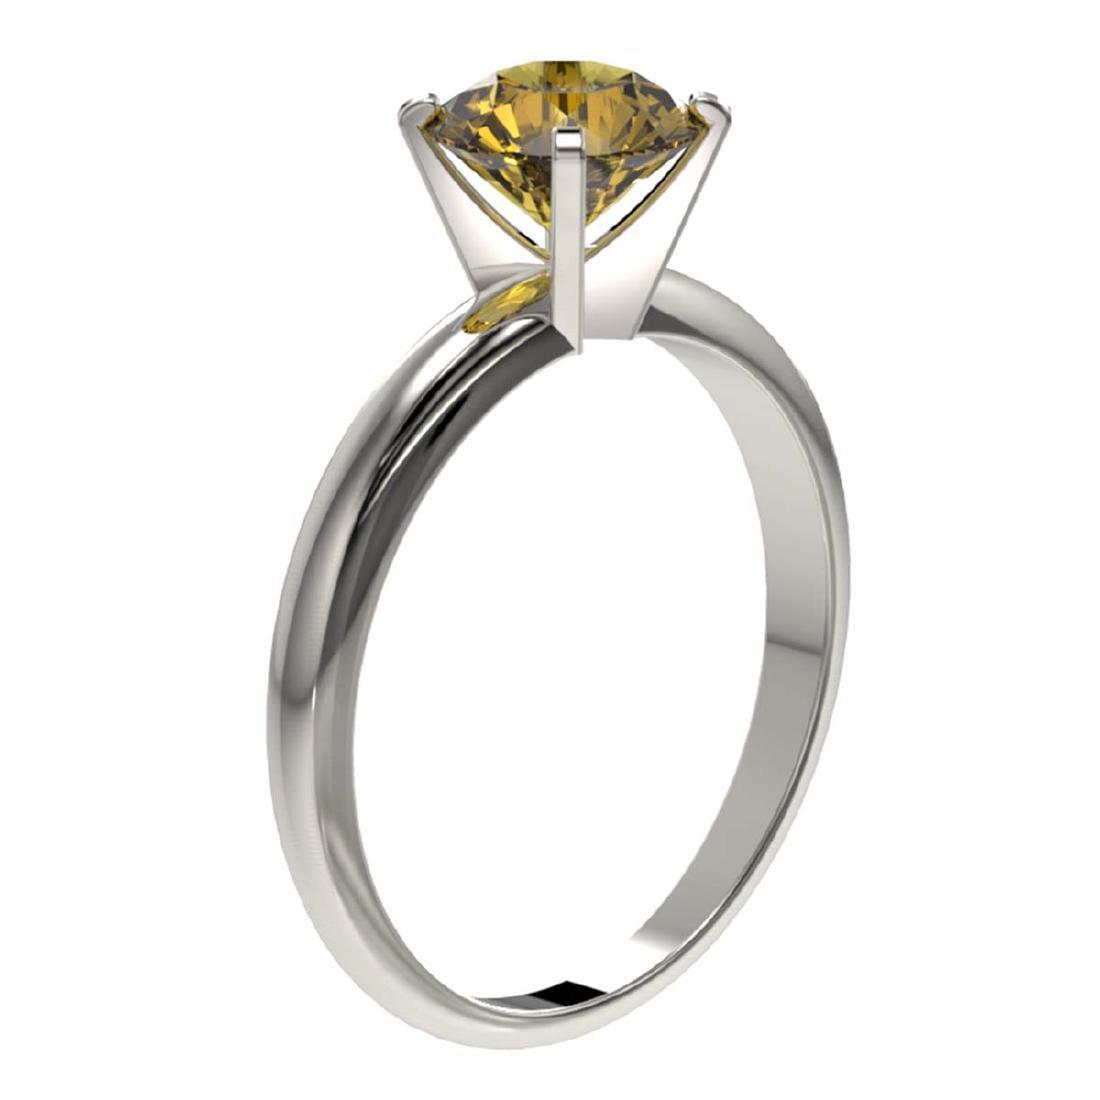 1.50 ctw Intense Yellow Diamond Solitaire Ring 10K - 3